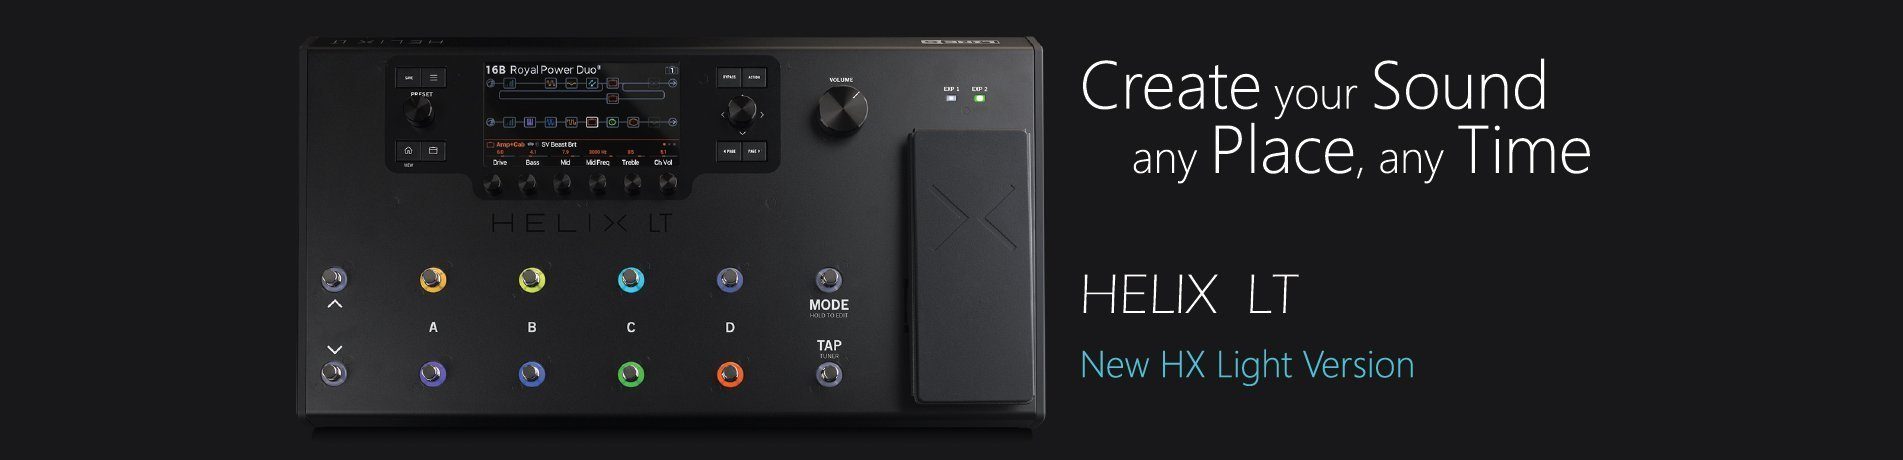 banner pubblicitario Helix LT